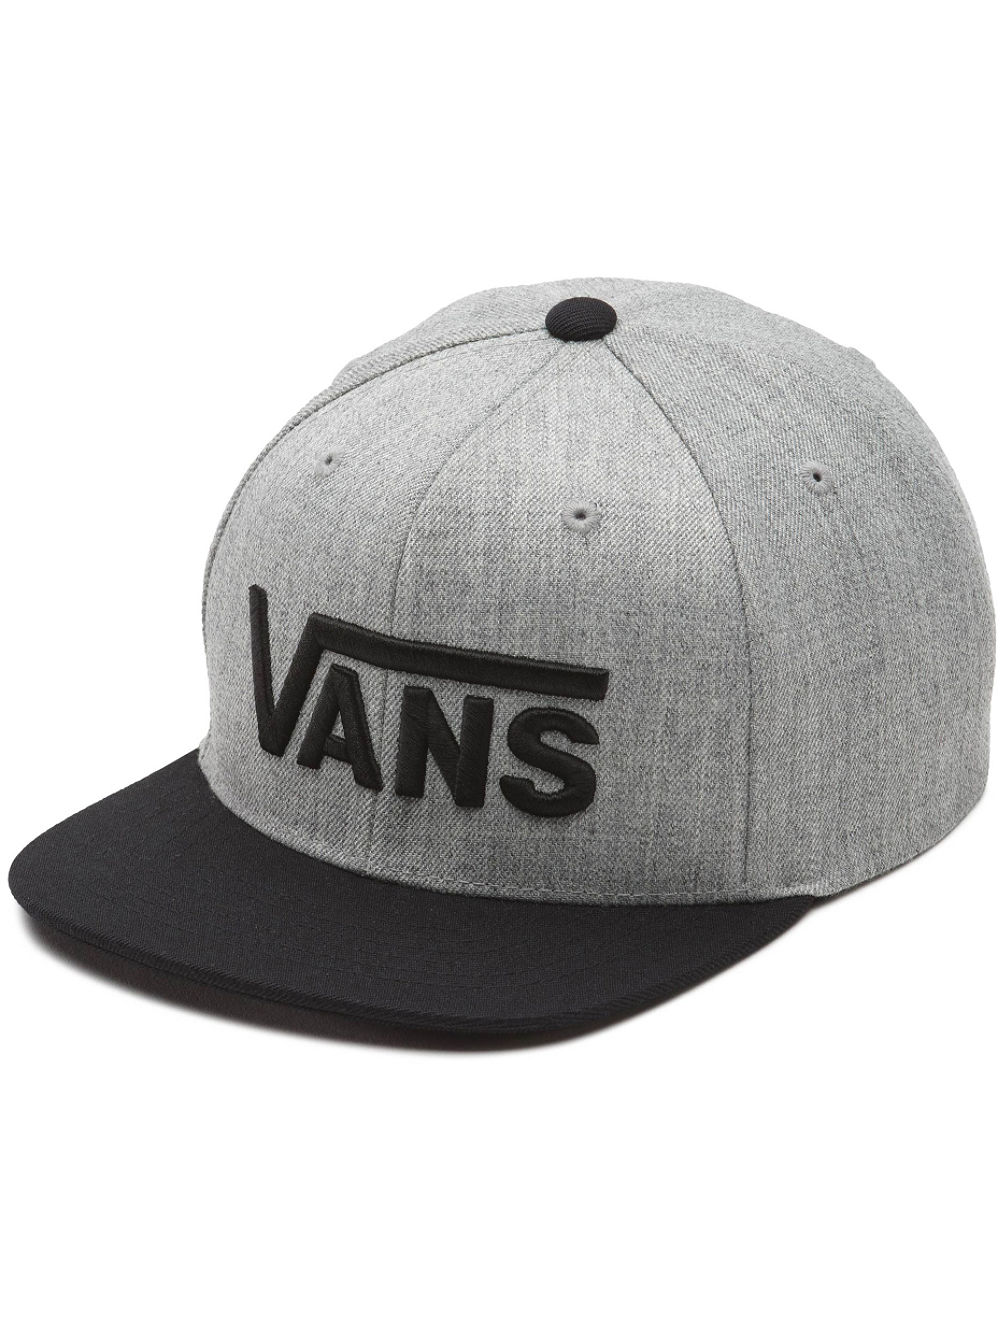 Osta Vans Drop V Snapback Lippis pojille verkosta blue-tomato.com 631d947bb0